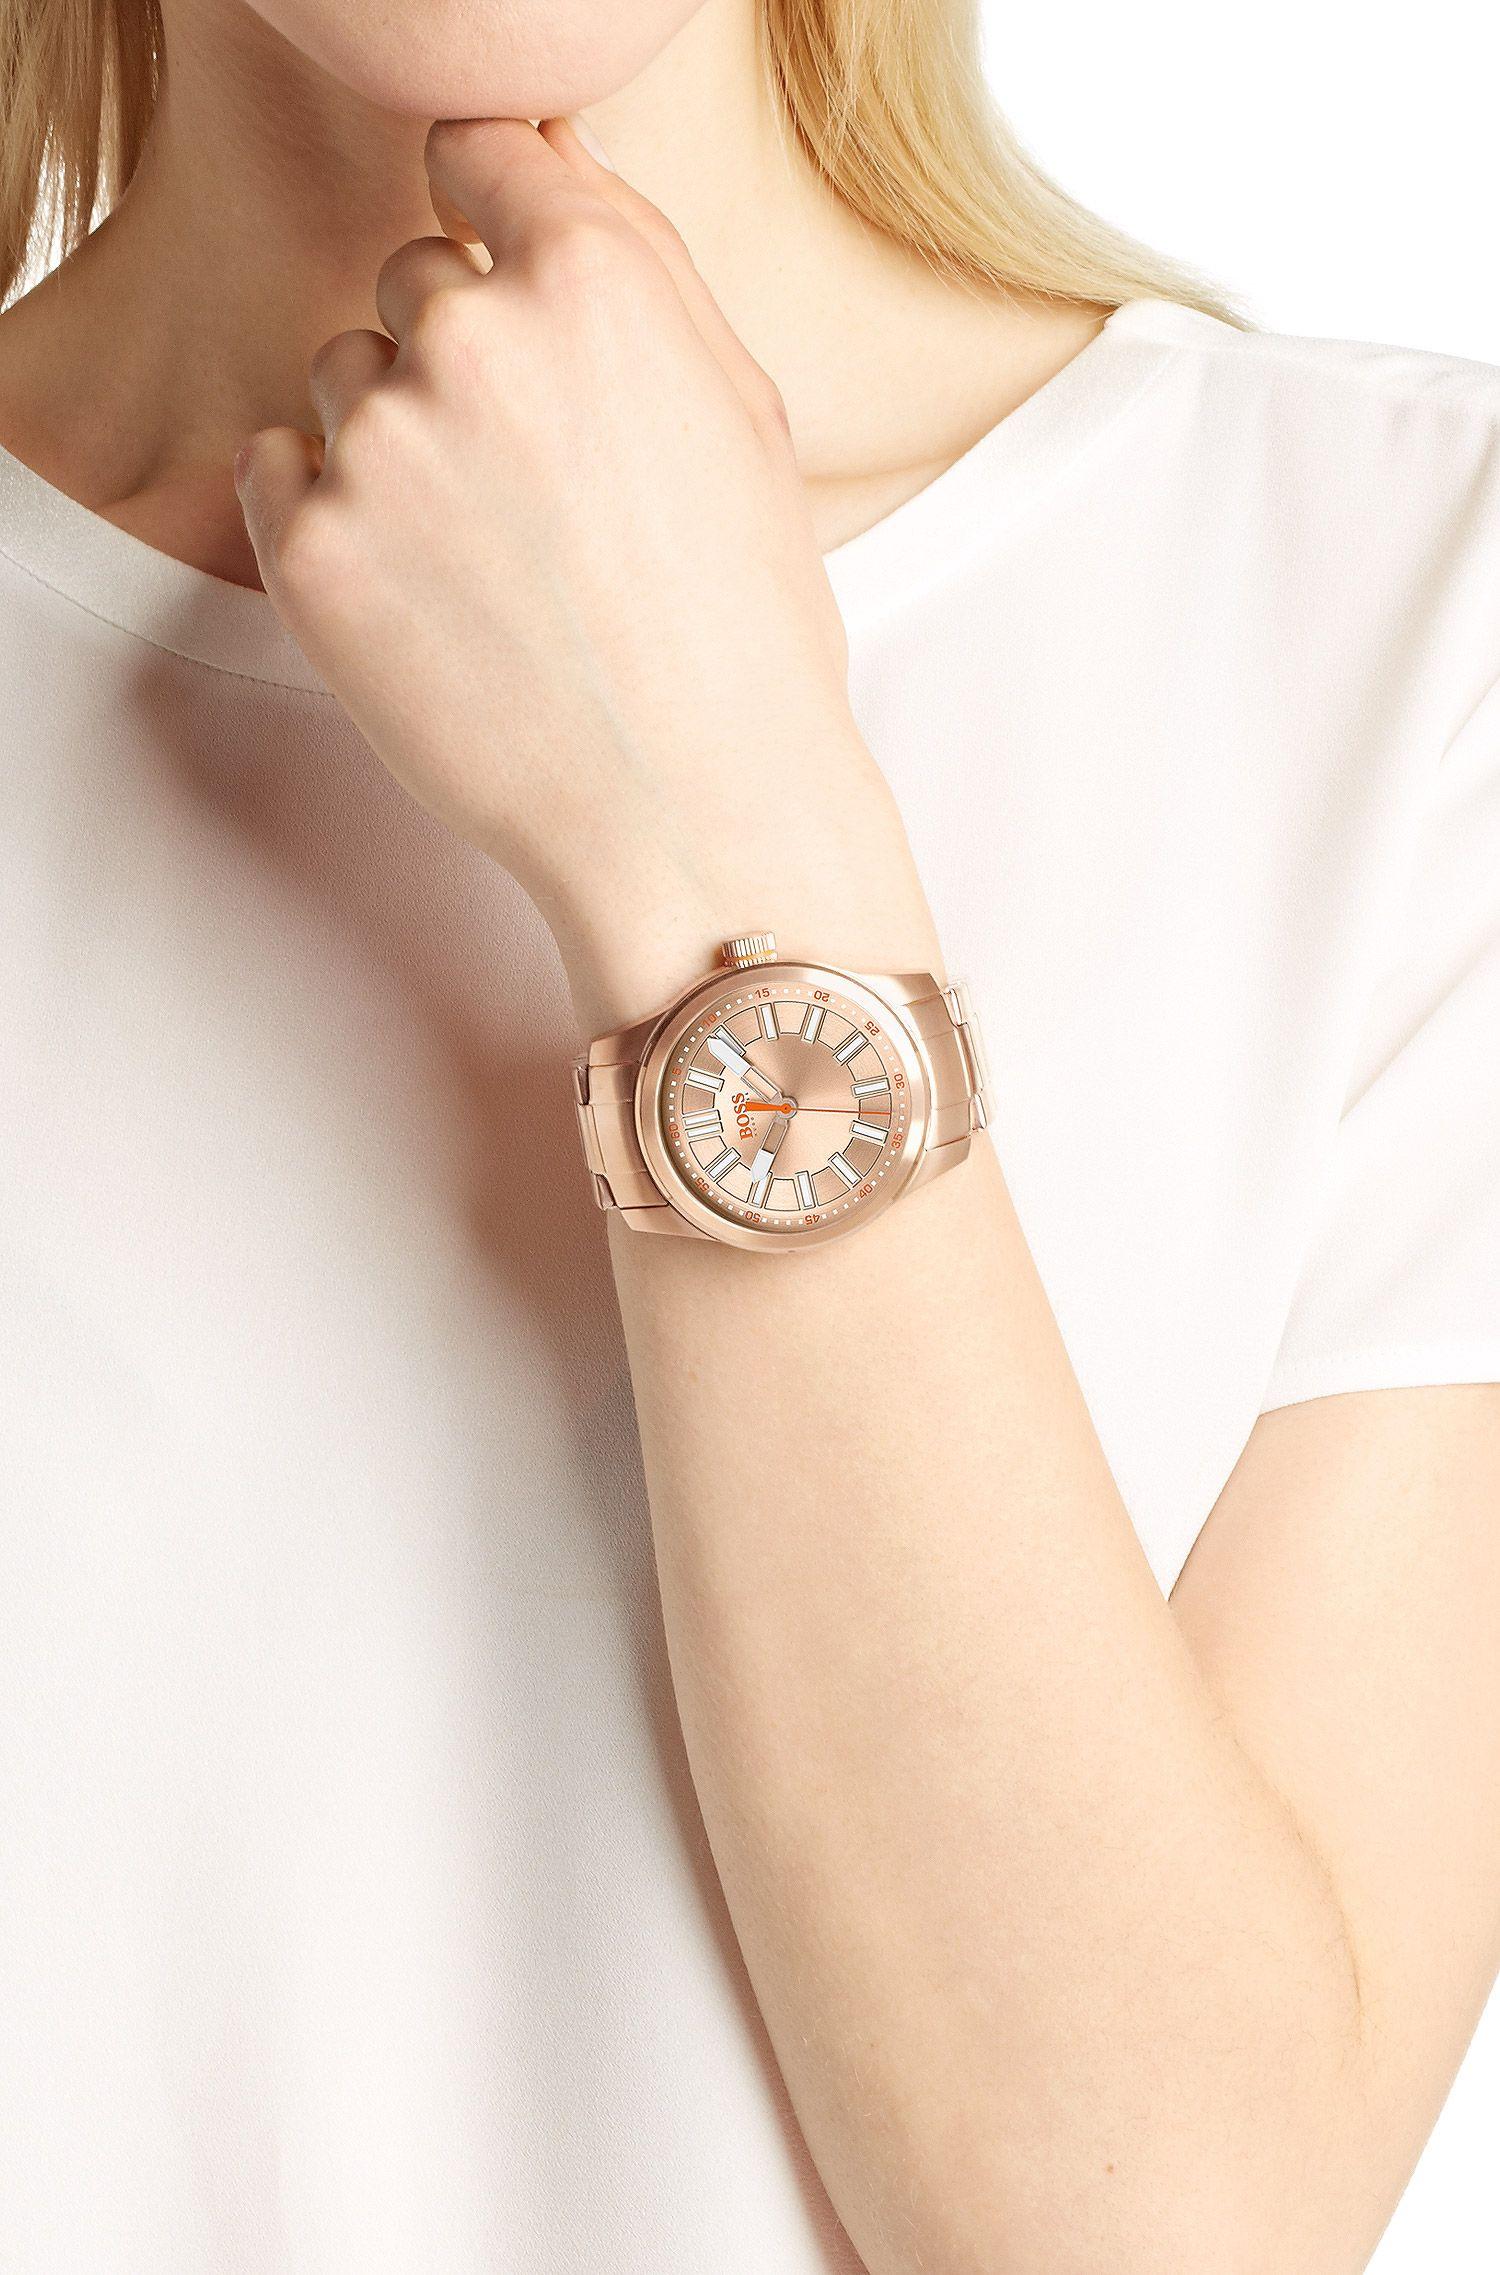 Montre-bracelet «HO7001» avec boîtier en acier inoxydable